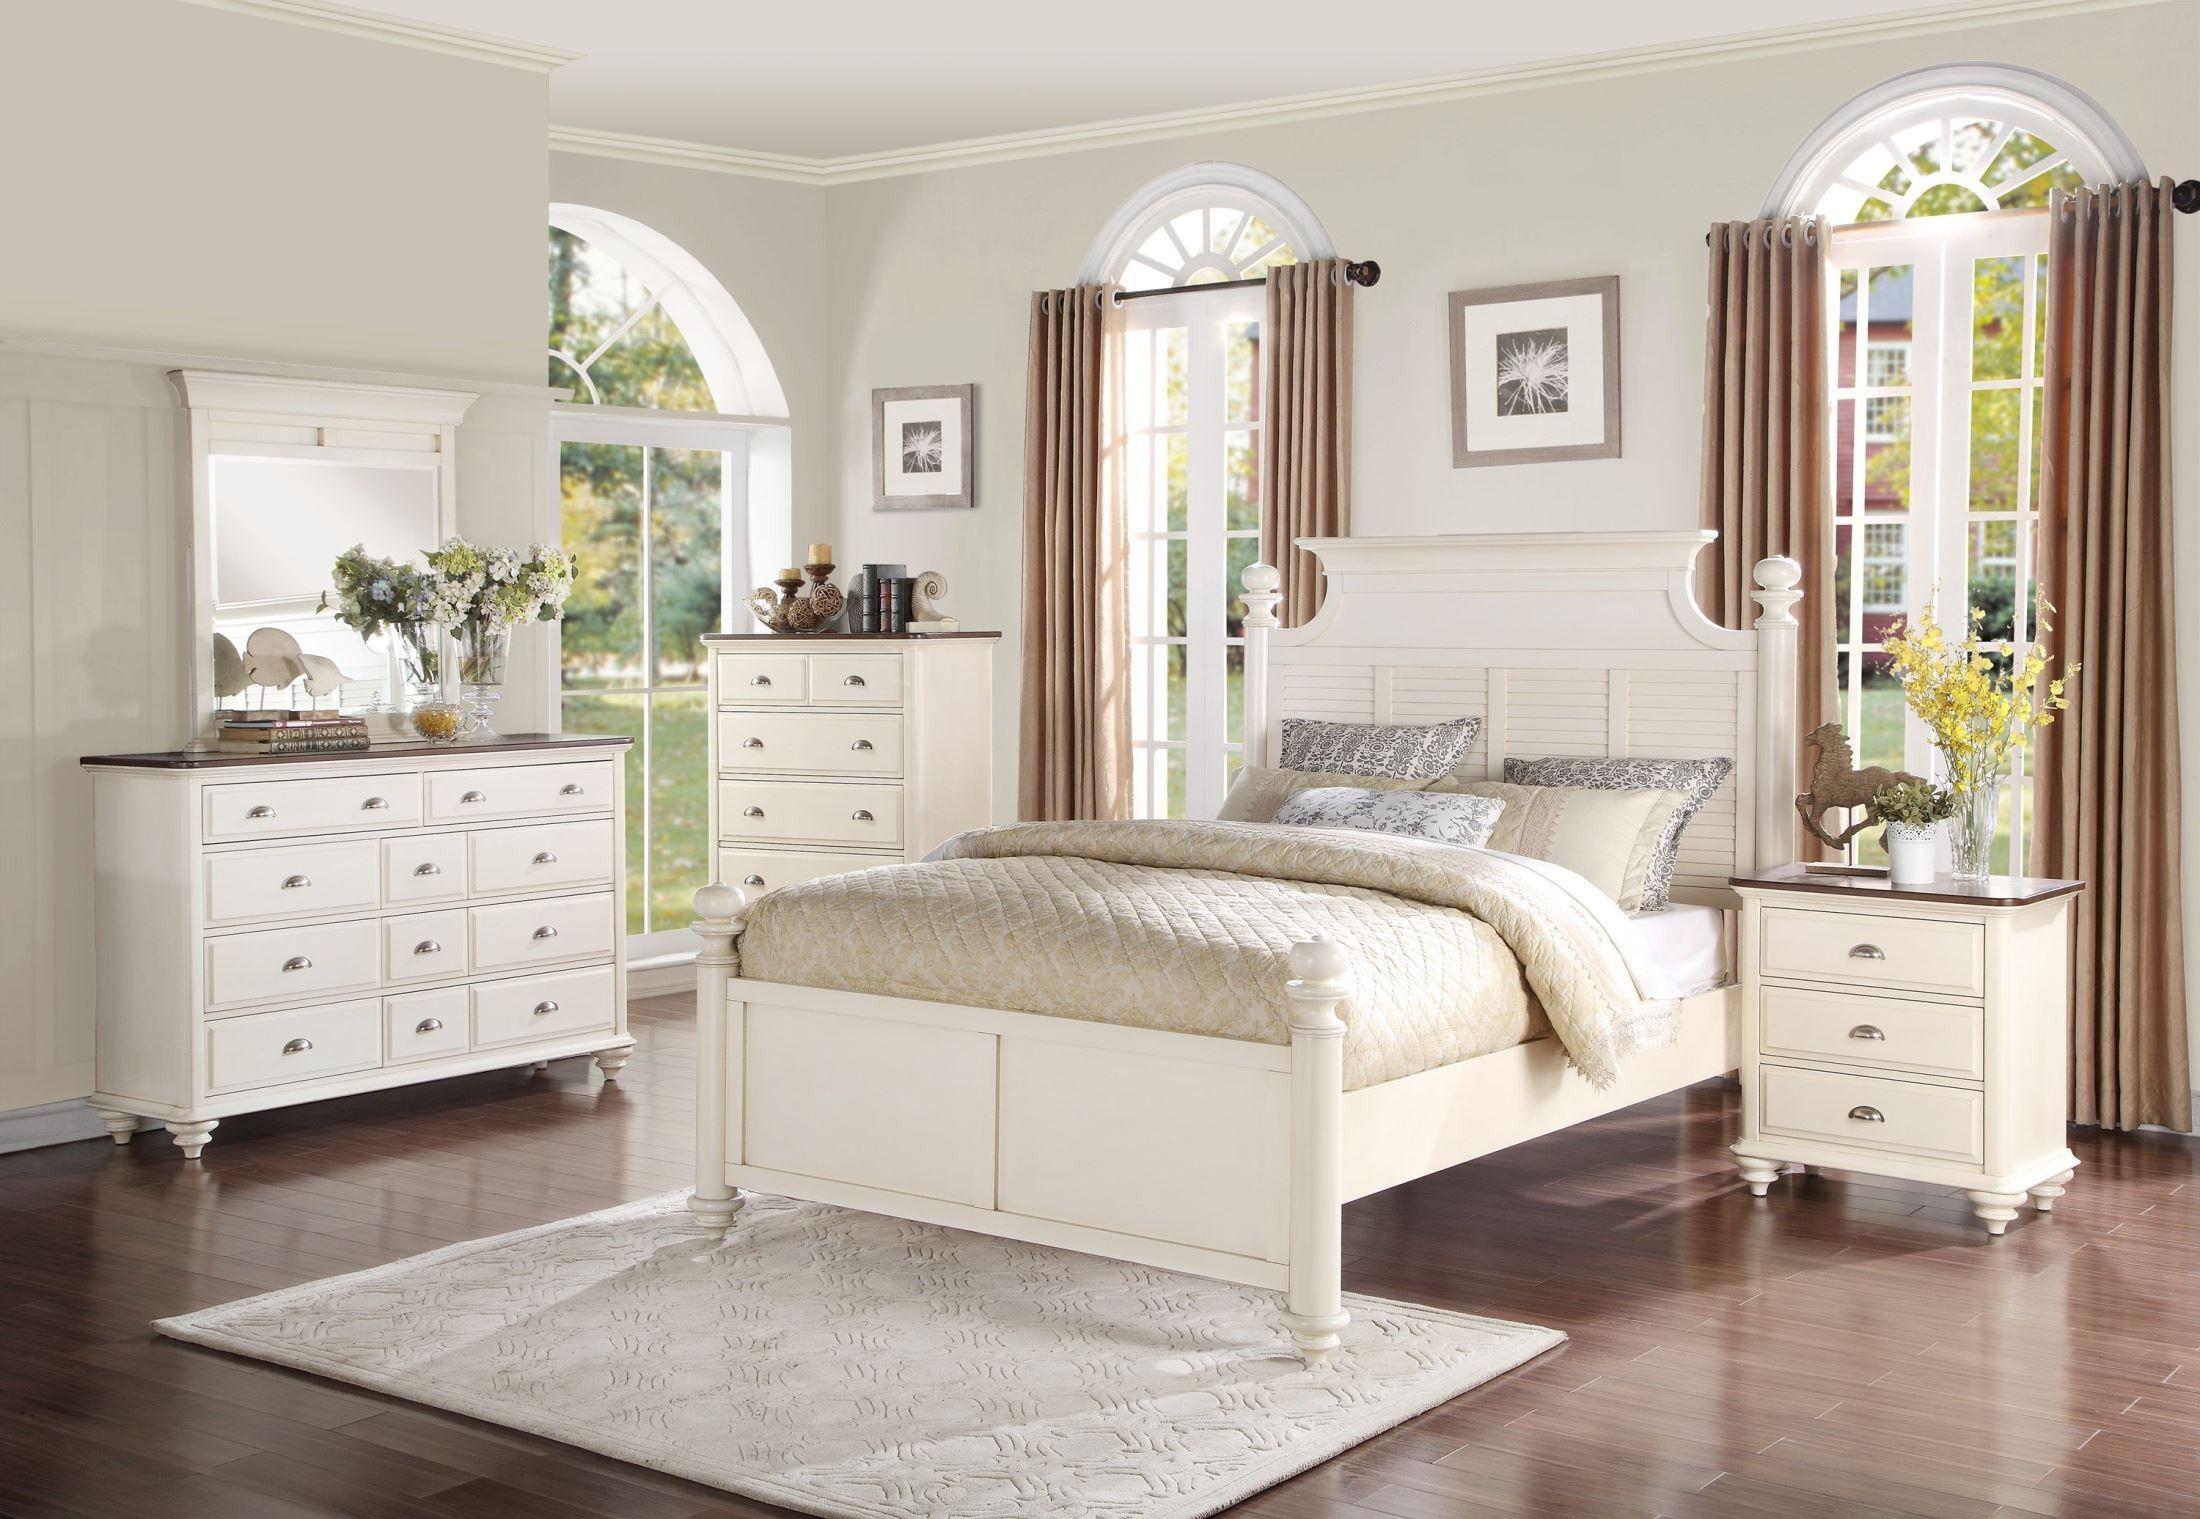 Floresville Antique White Dresser White Bedroom Set Bedroom Furniture Sets Bedroom Set Antique white bedroom sets